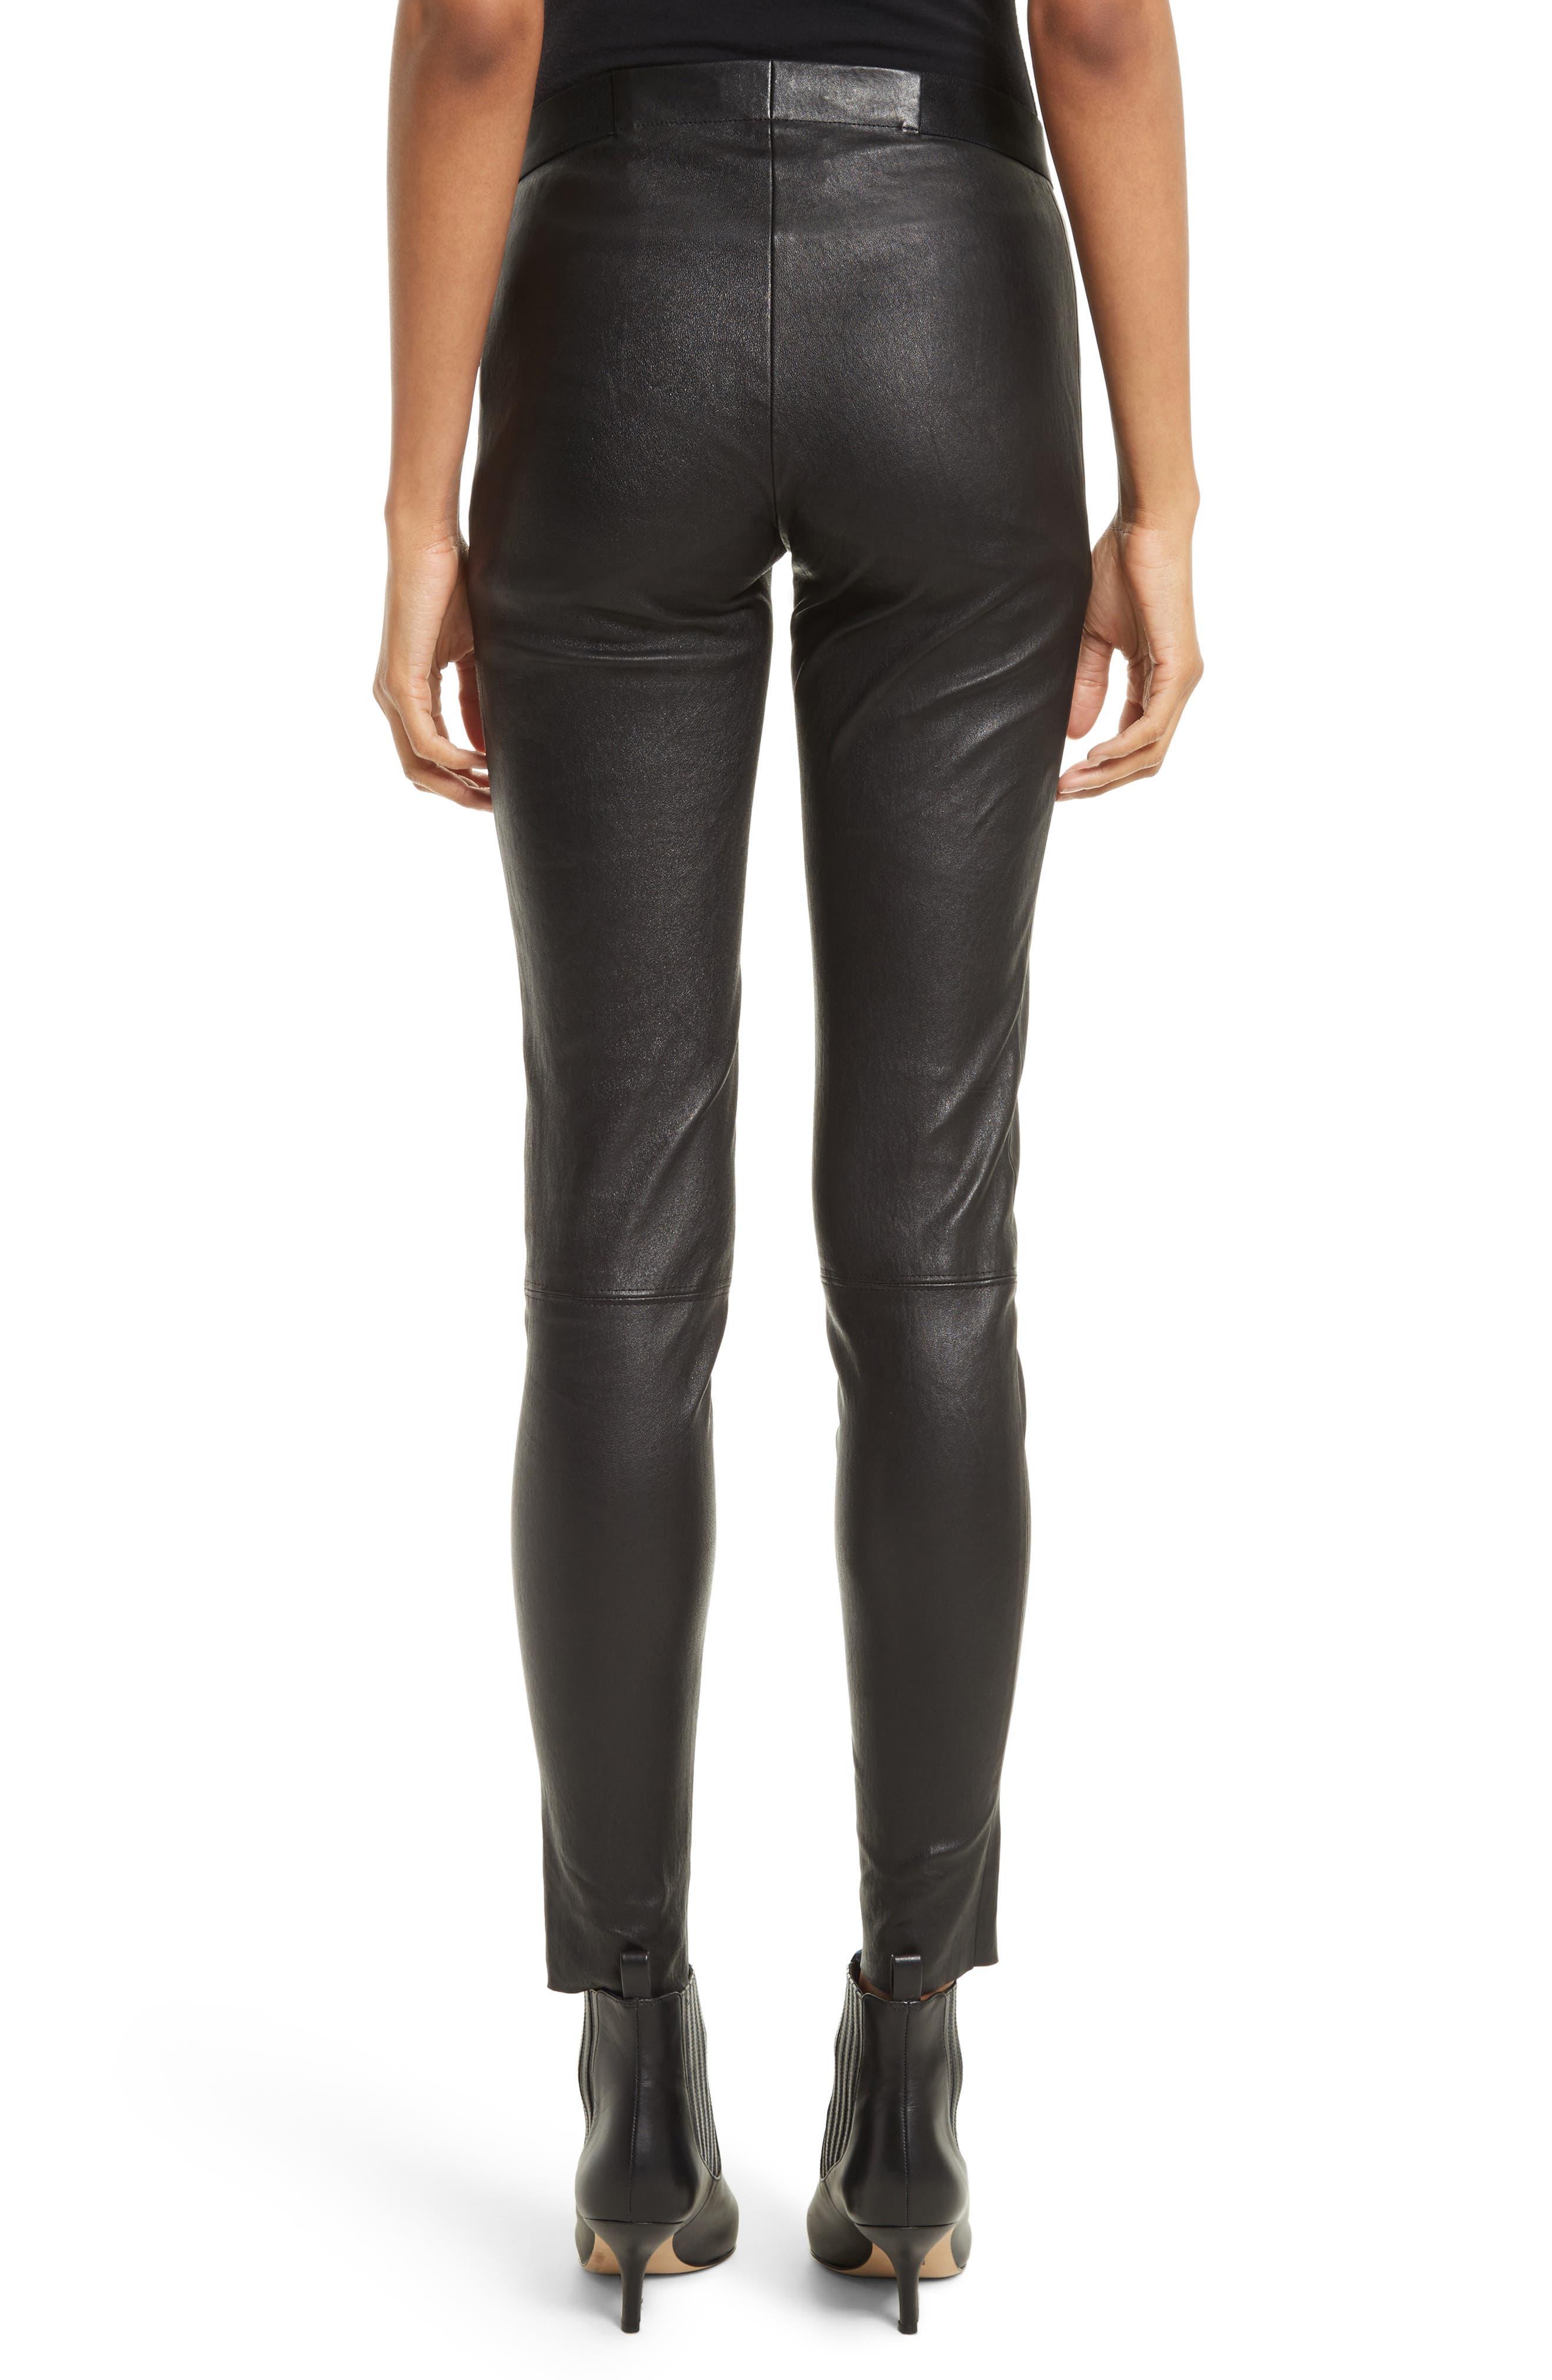 ALICE + OLIVIA, Leather Leggings, Alternate thumbnail 2, color, BLACK